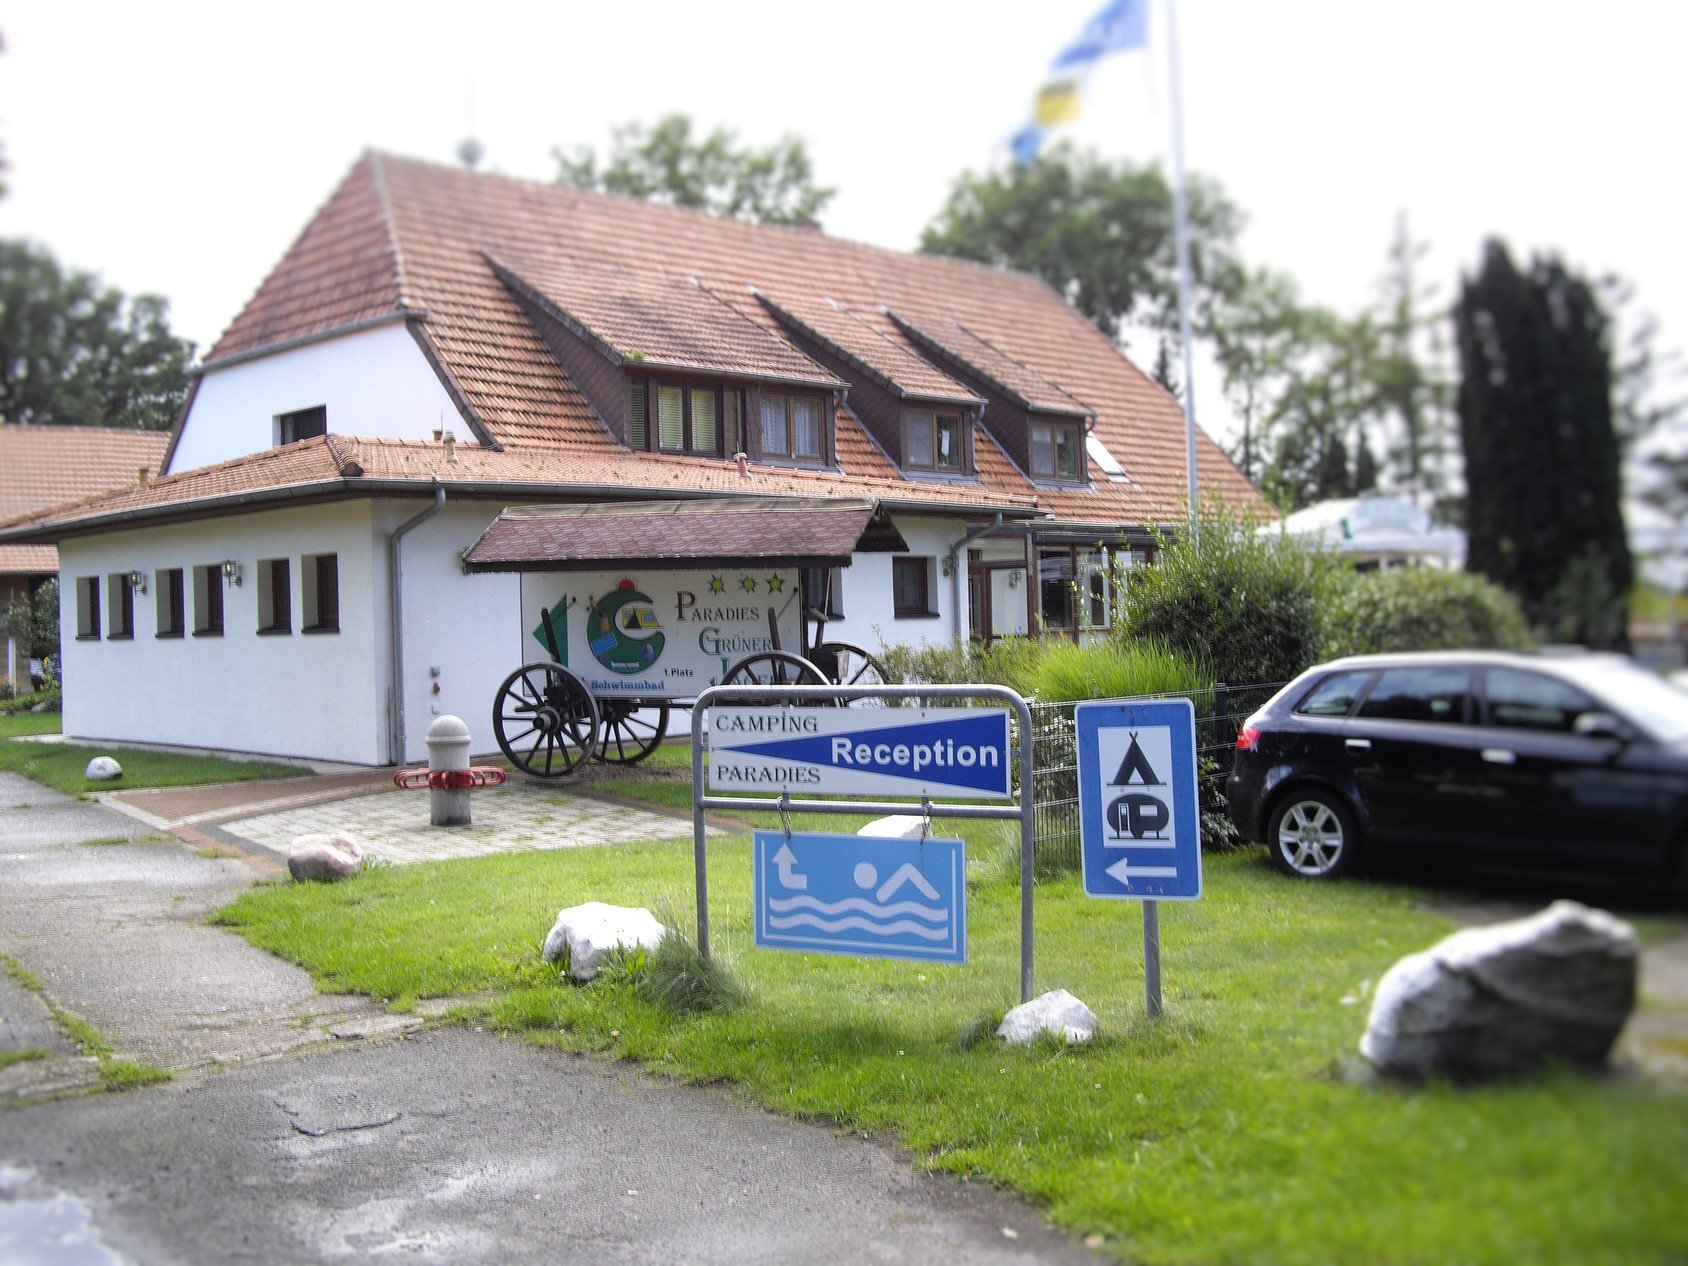 Duitsland-Everinghausen-CampingParadies%20Gruner%20Jager-ExtraLarge Campings Duitsland